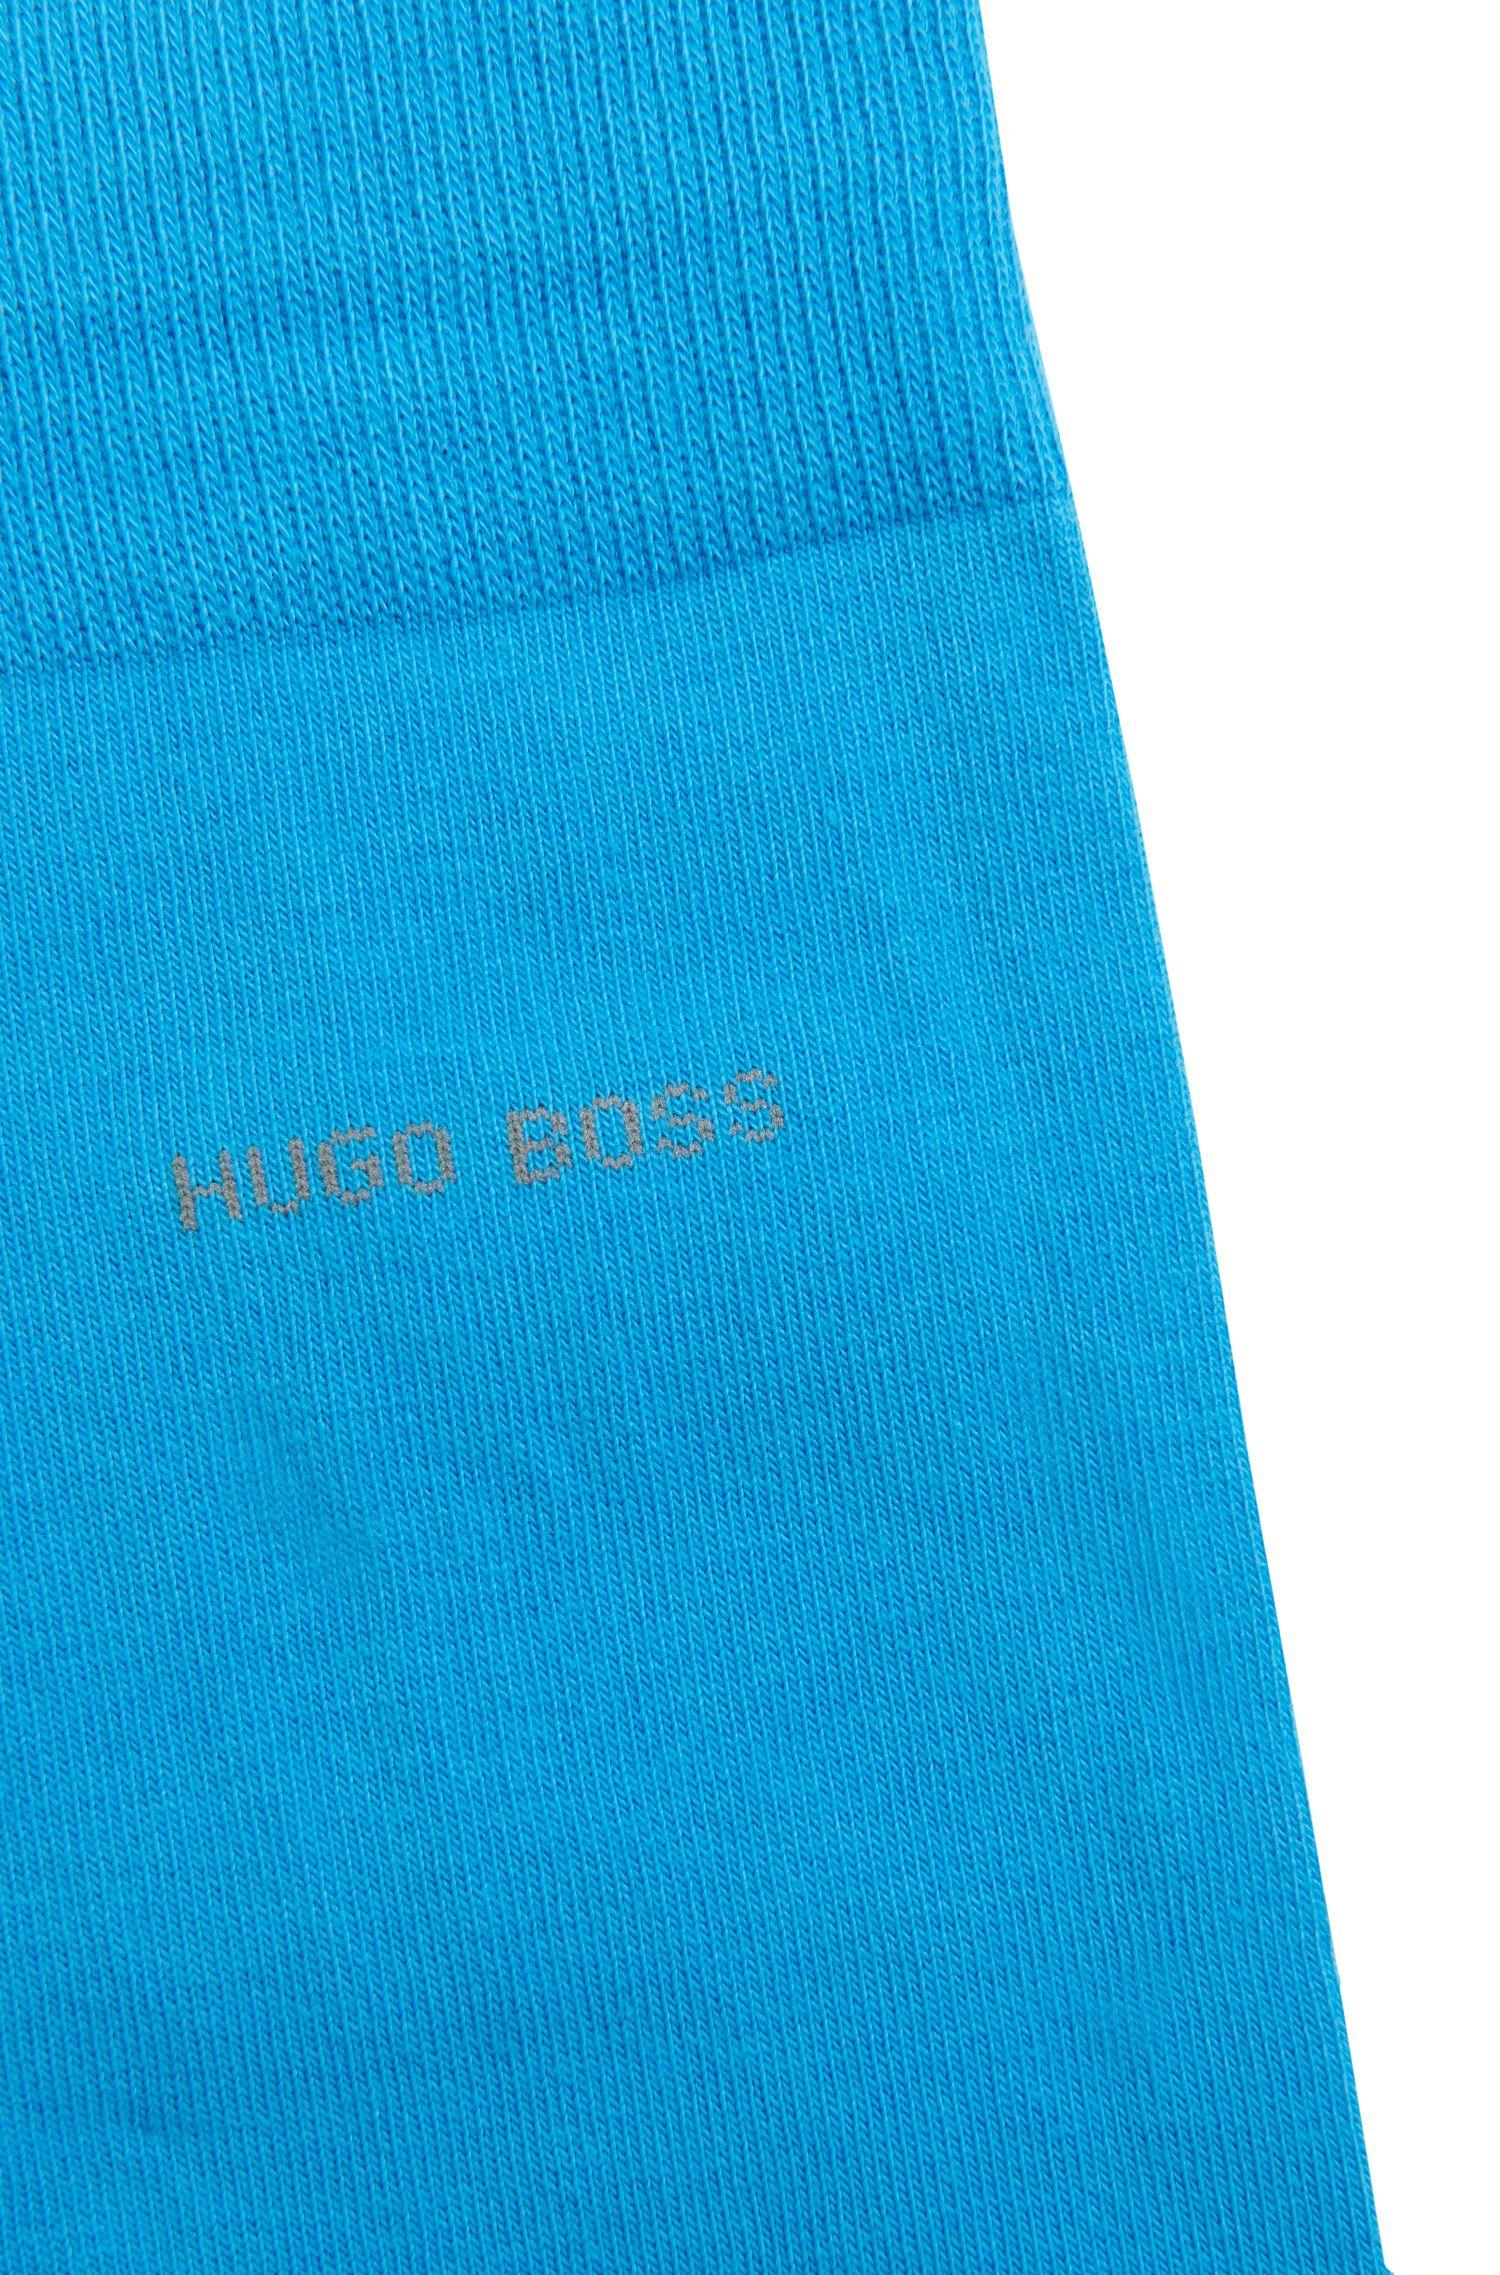 Unifarbene Socken aus Stretch-Baumwolle: 'Marc Colours'